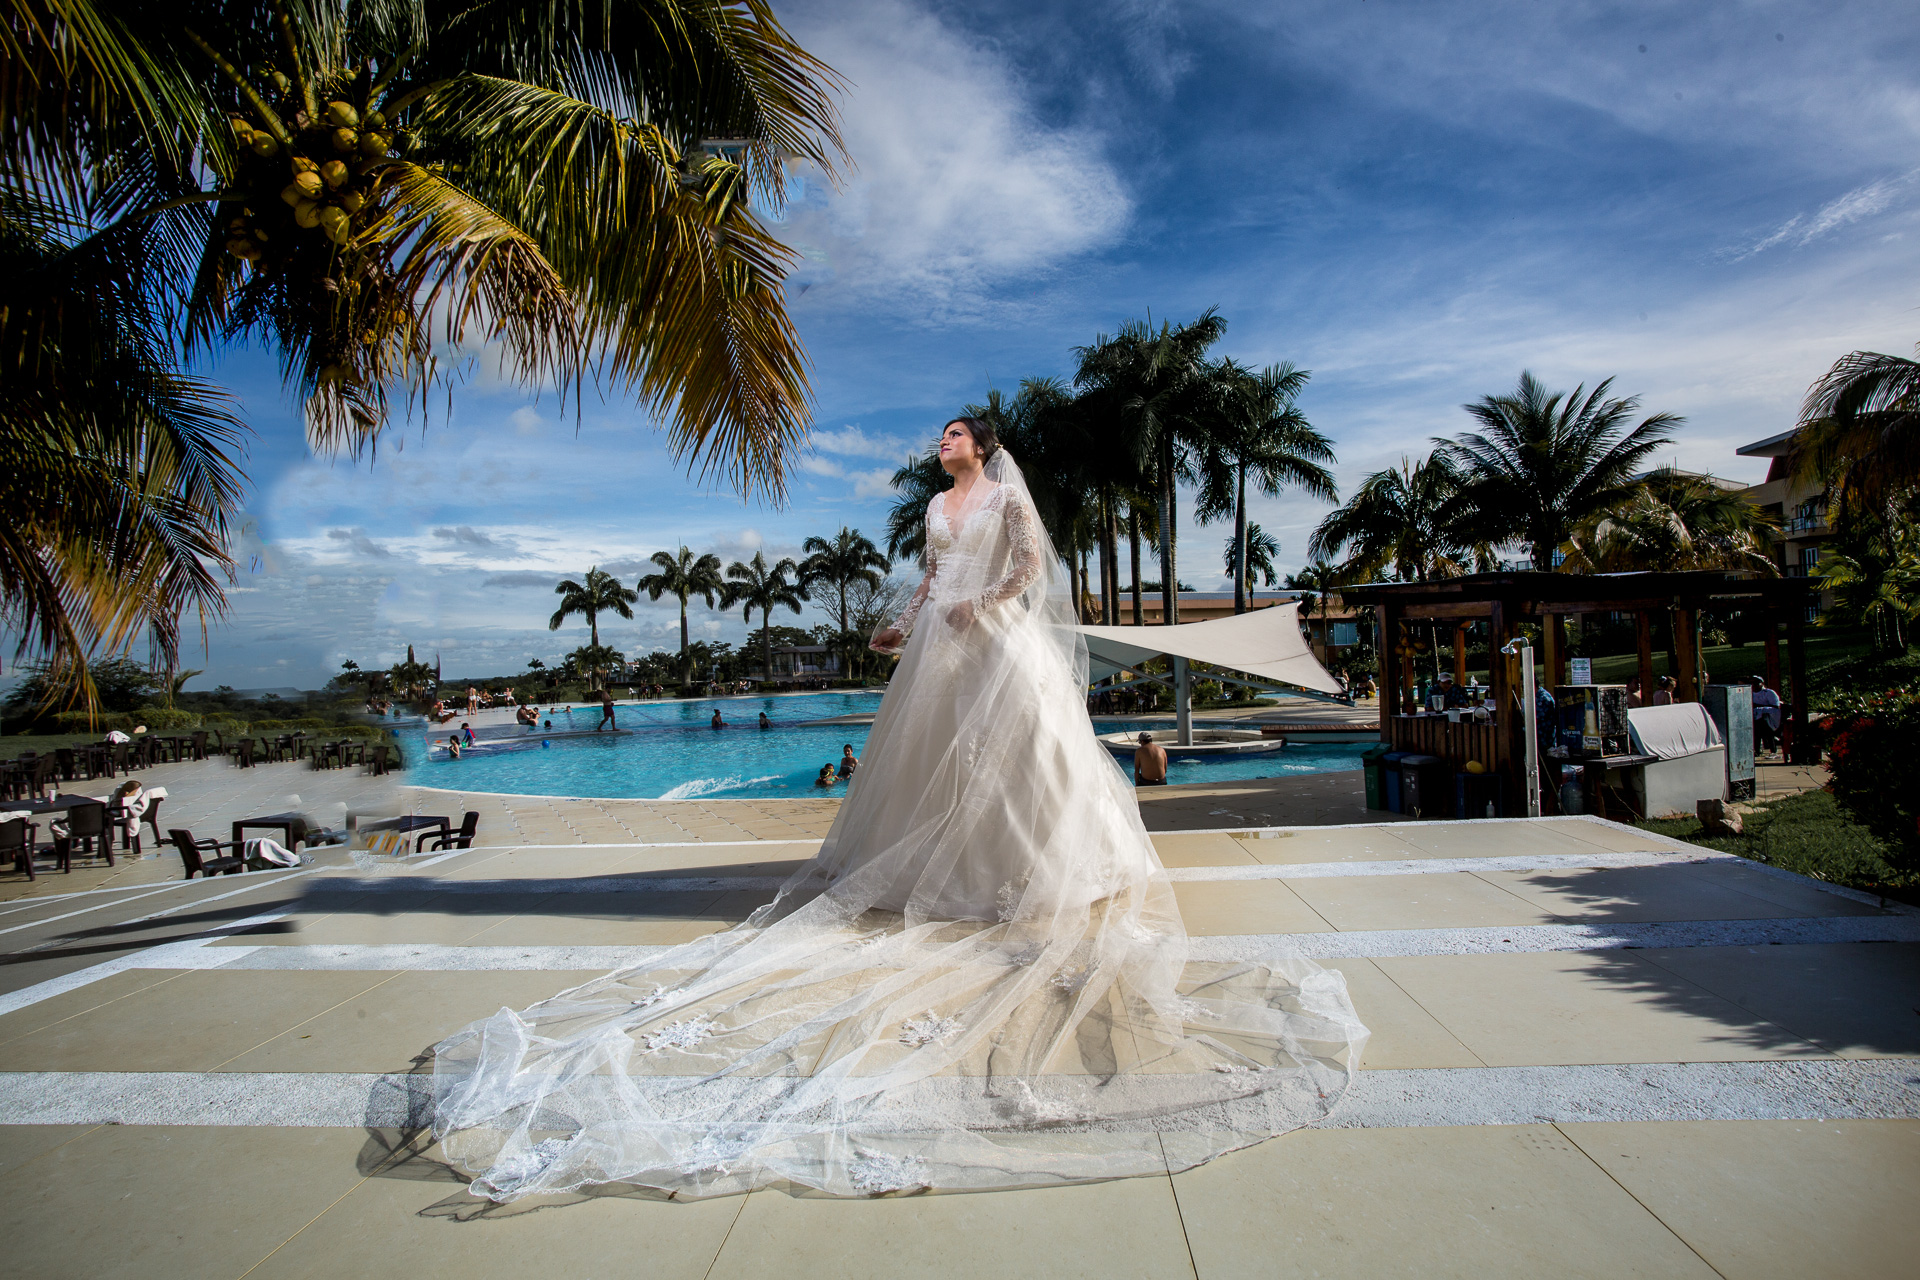 Fotógrafos-de-bodas-en-Colombia-Sthephanie-y-David-33 STEPHANIE + DAVID